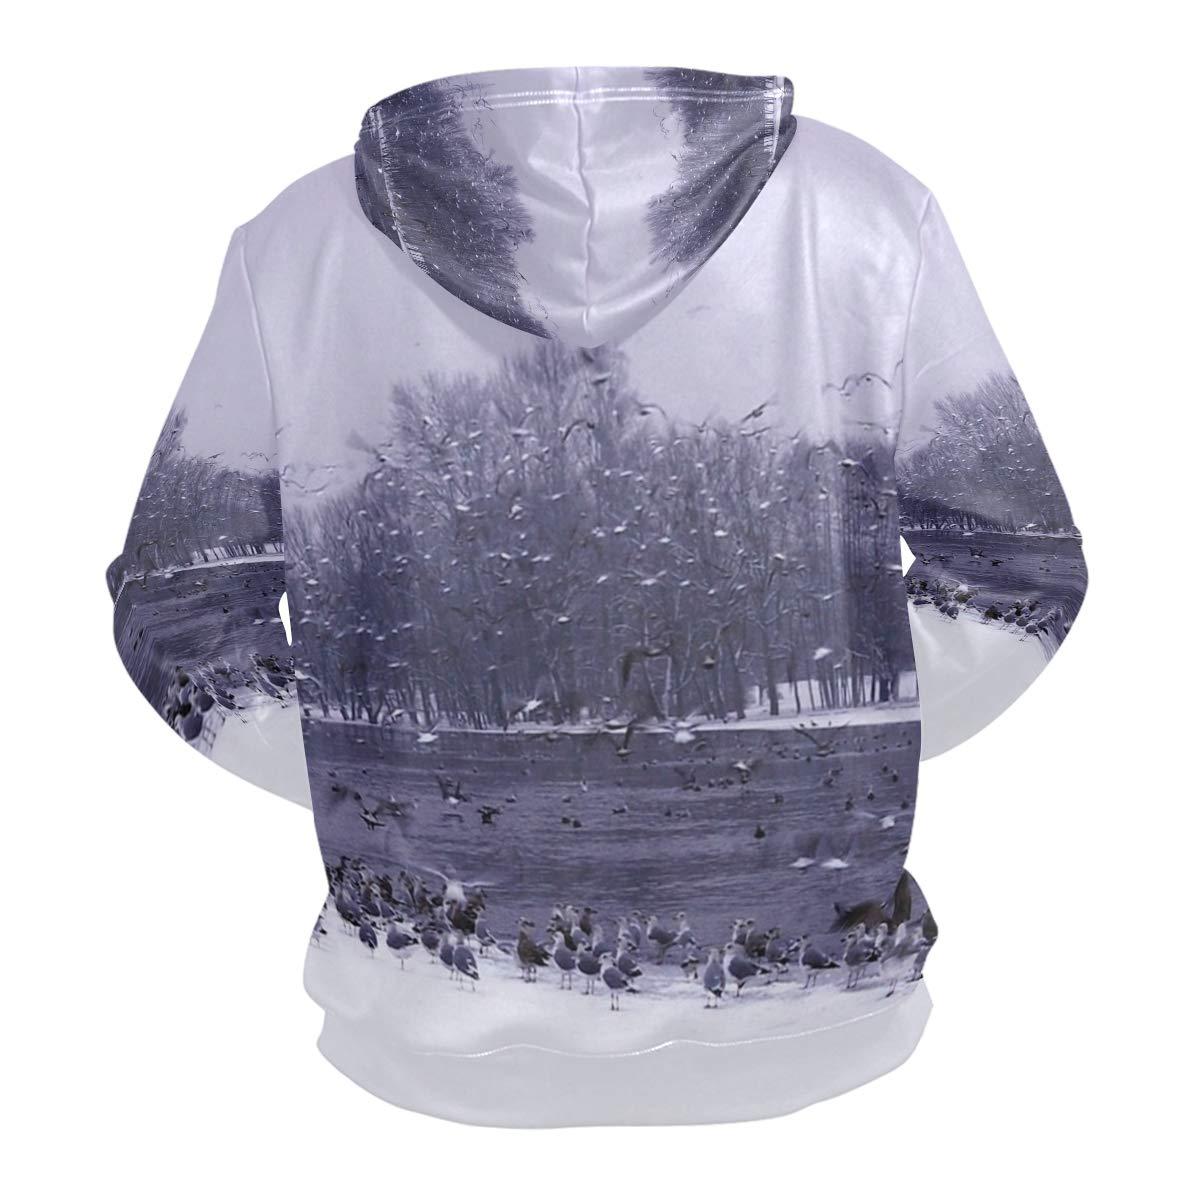 Pingshoes 3D Hoodie Wallpaper Cave Pullover Hooded Sweatshirts Long Sleeve Shirt